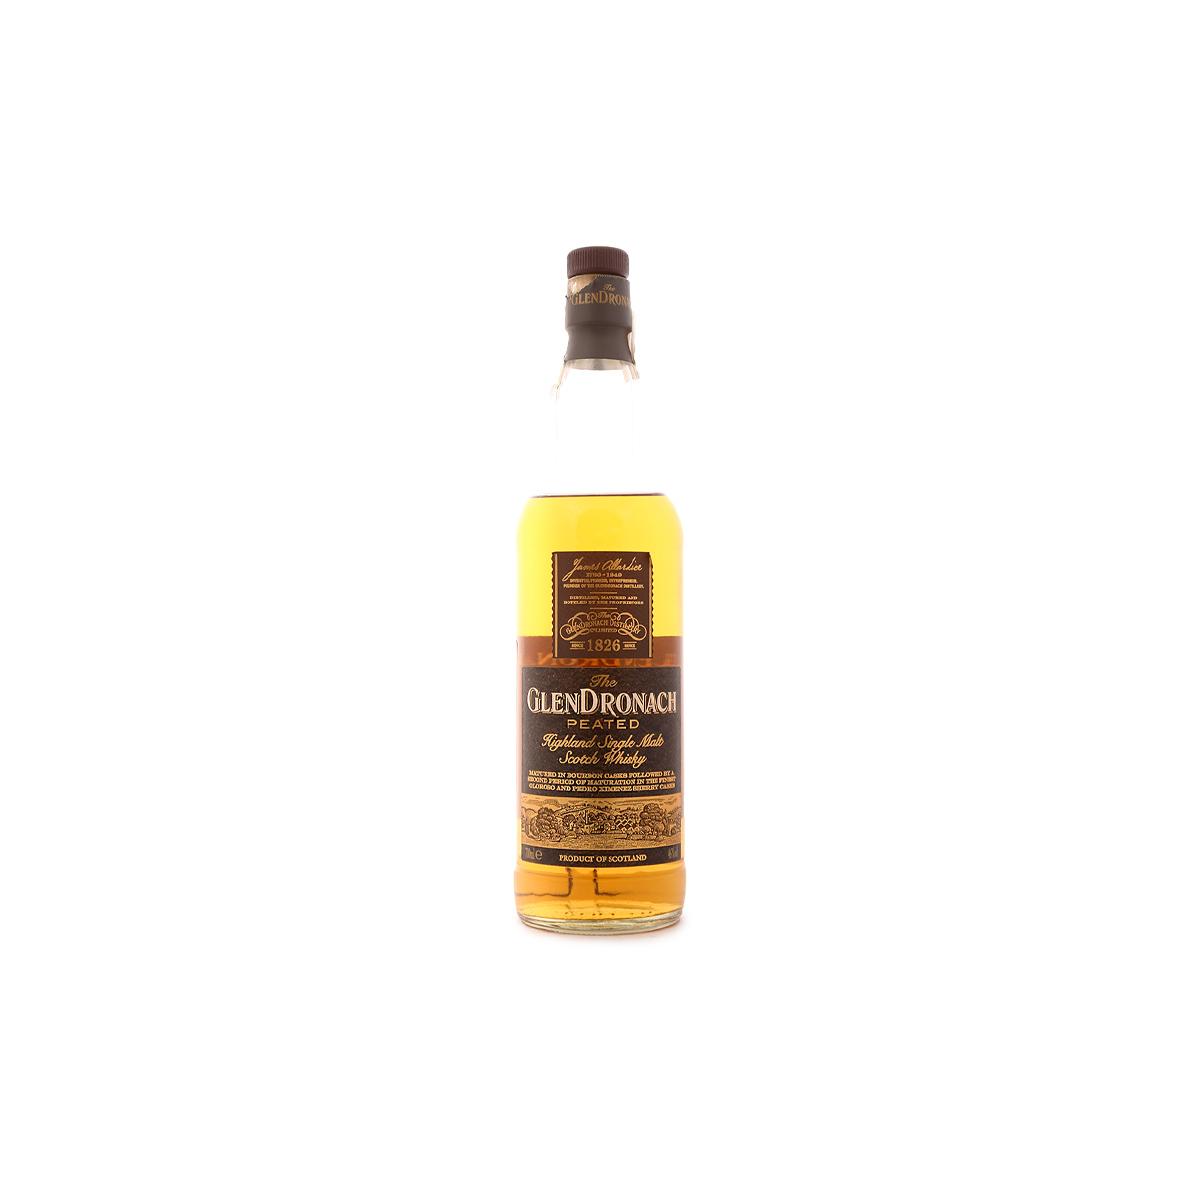 GlenDronach Peated (46%) - 30 ml.